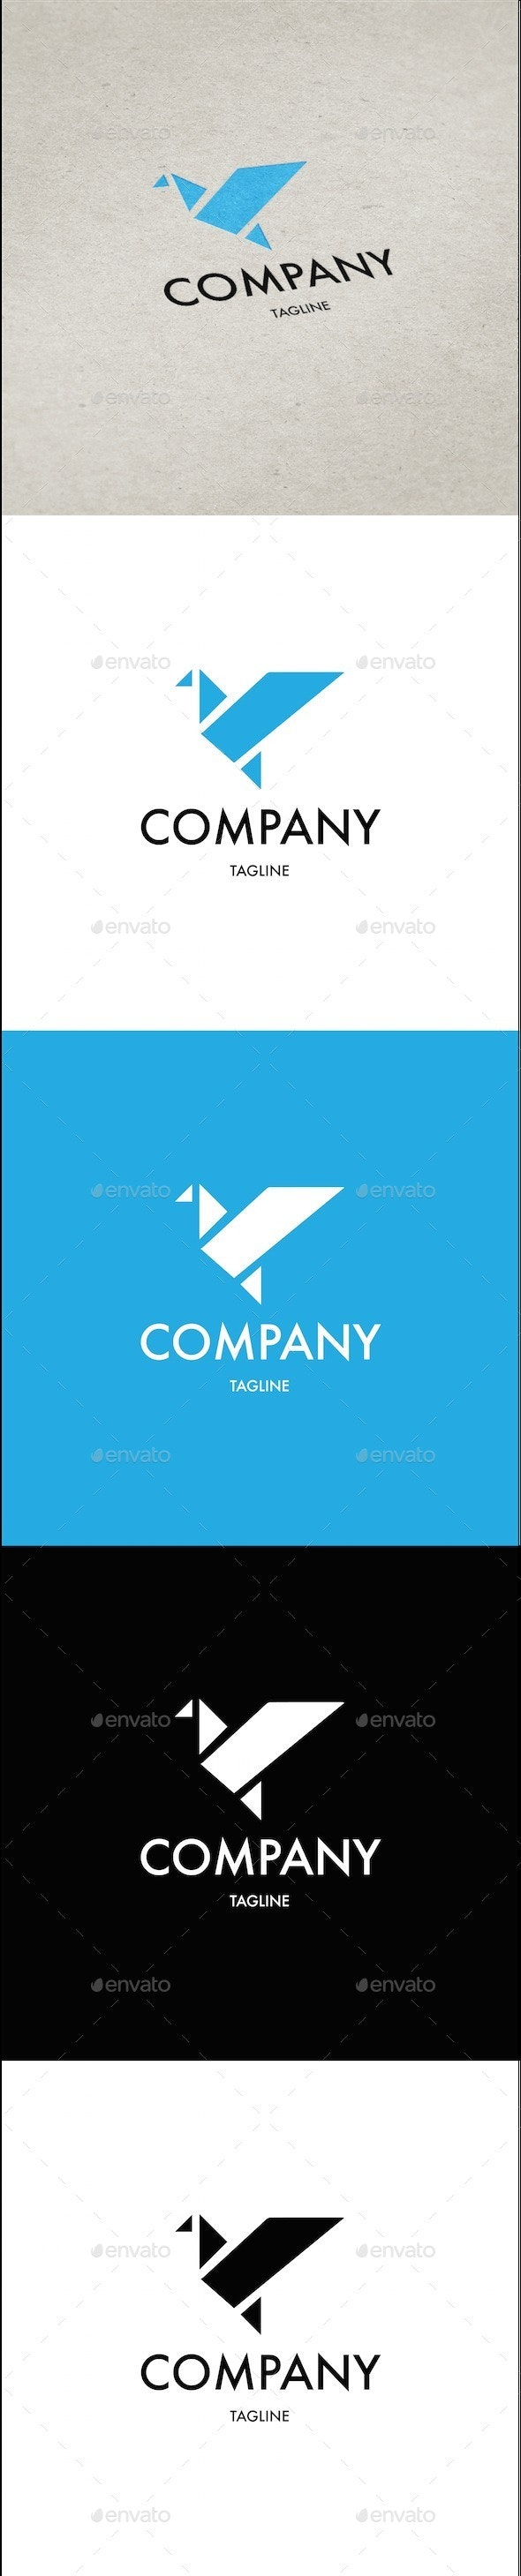 Origami Bird Logo Template - Animals Logo Templates